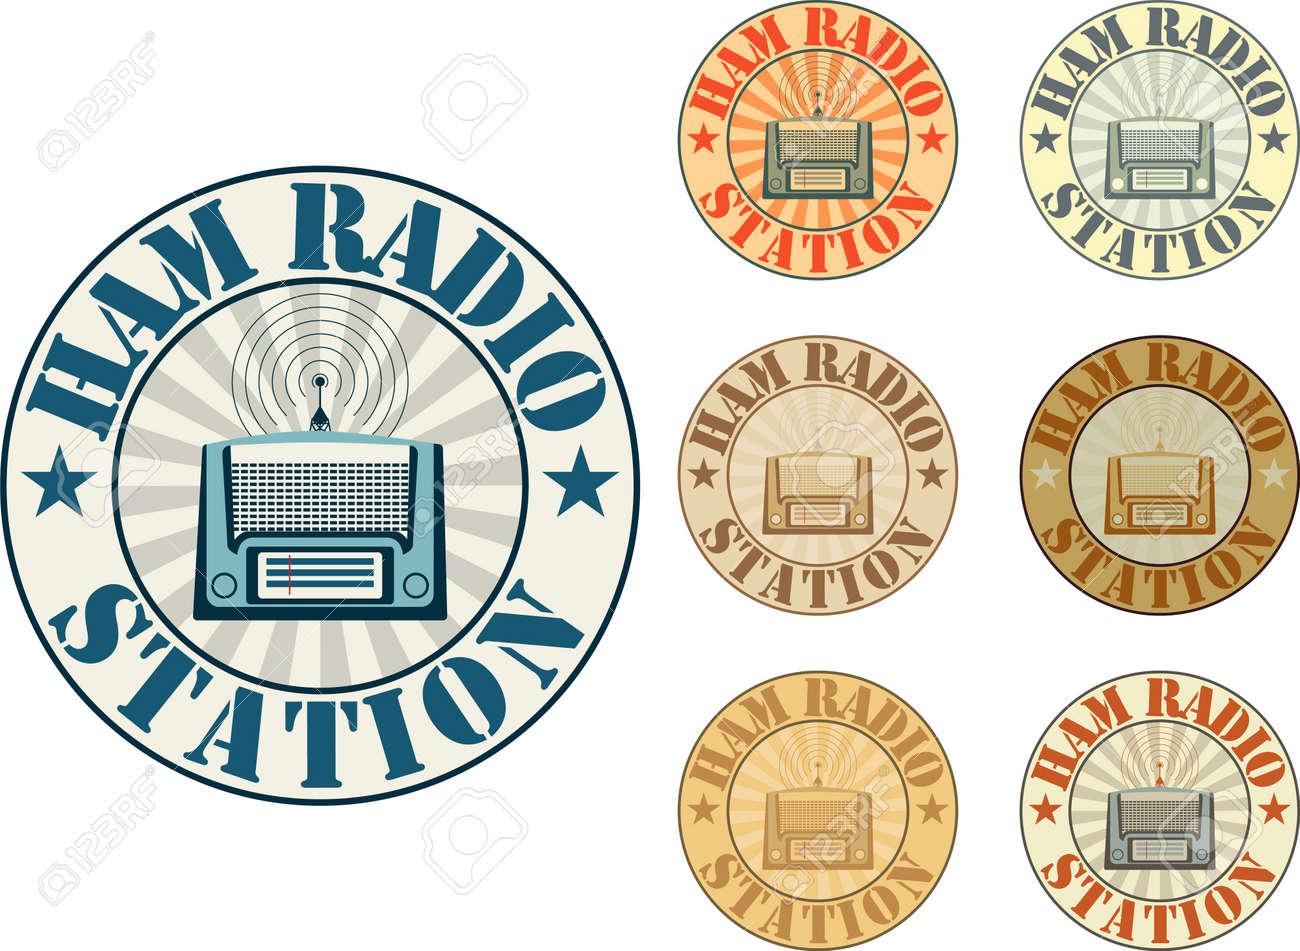 Vintage style ham radio station badges - 22170573